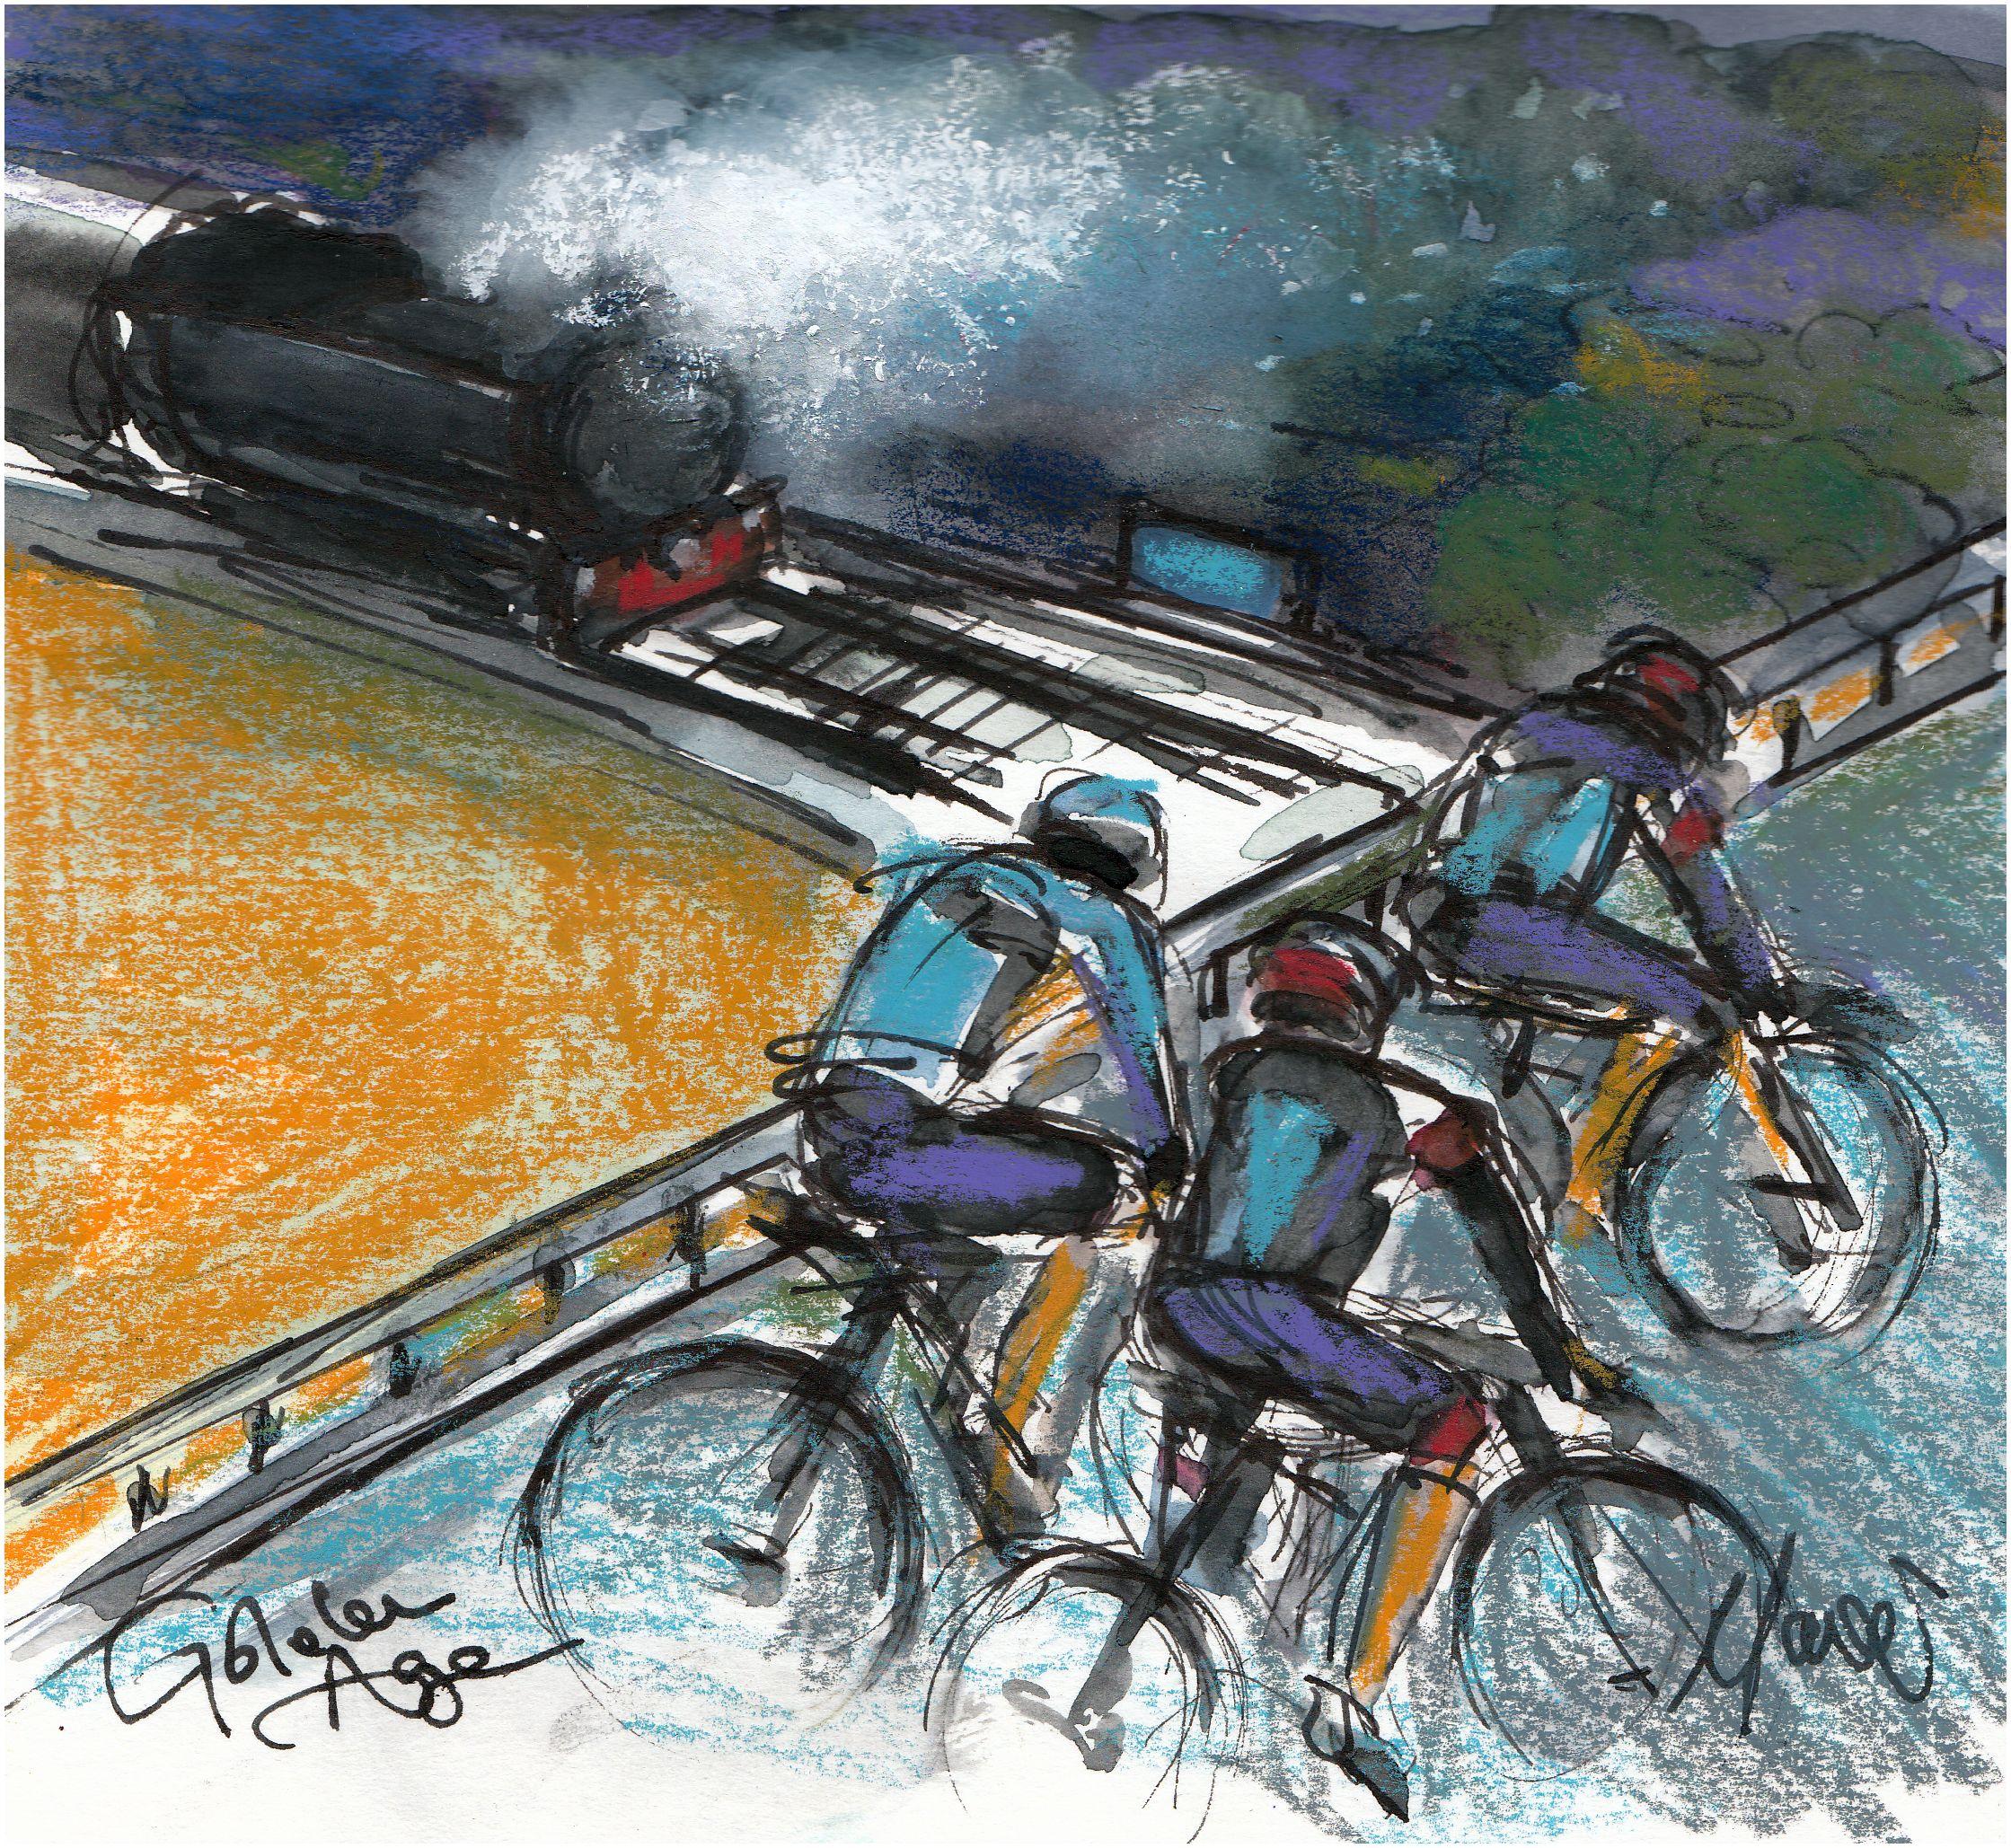 Tour de Yorkshire, cycling art, steam locomotive